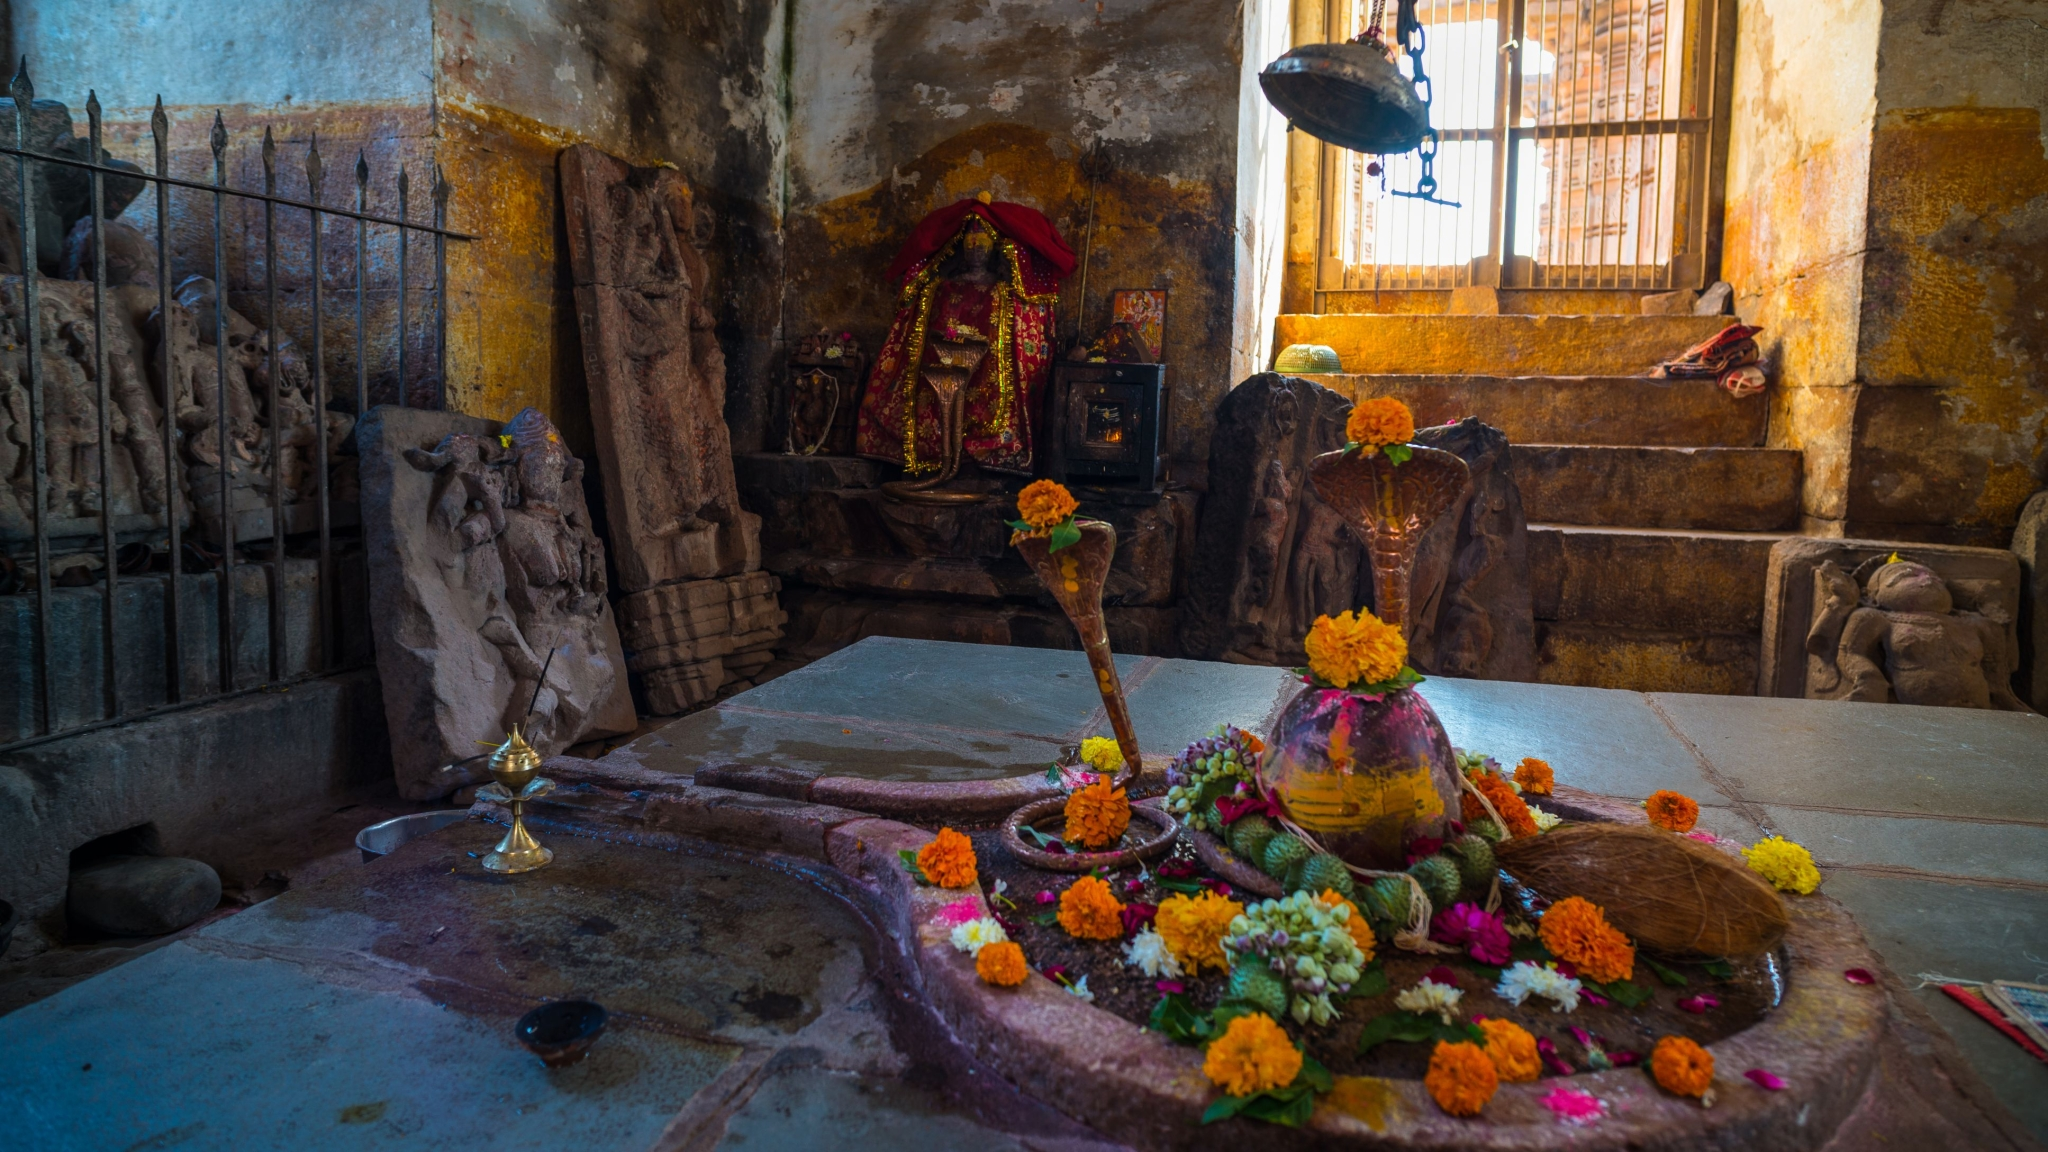 IRCTC Tourism: Shravan Special 5 Jyotirlinga Yatra for 7,560